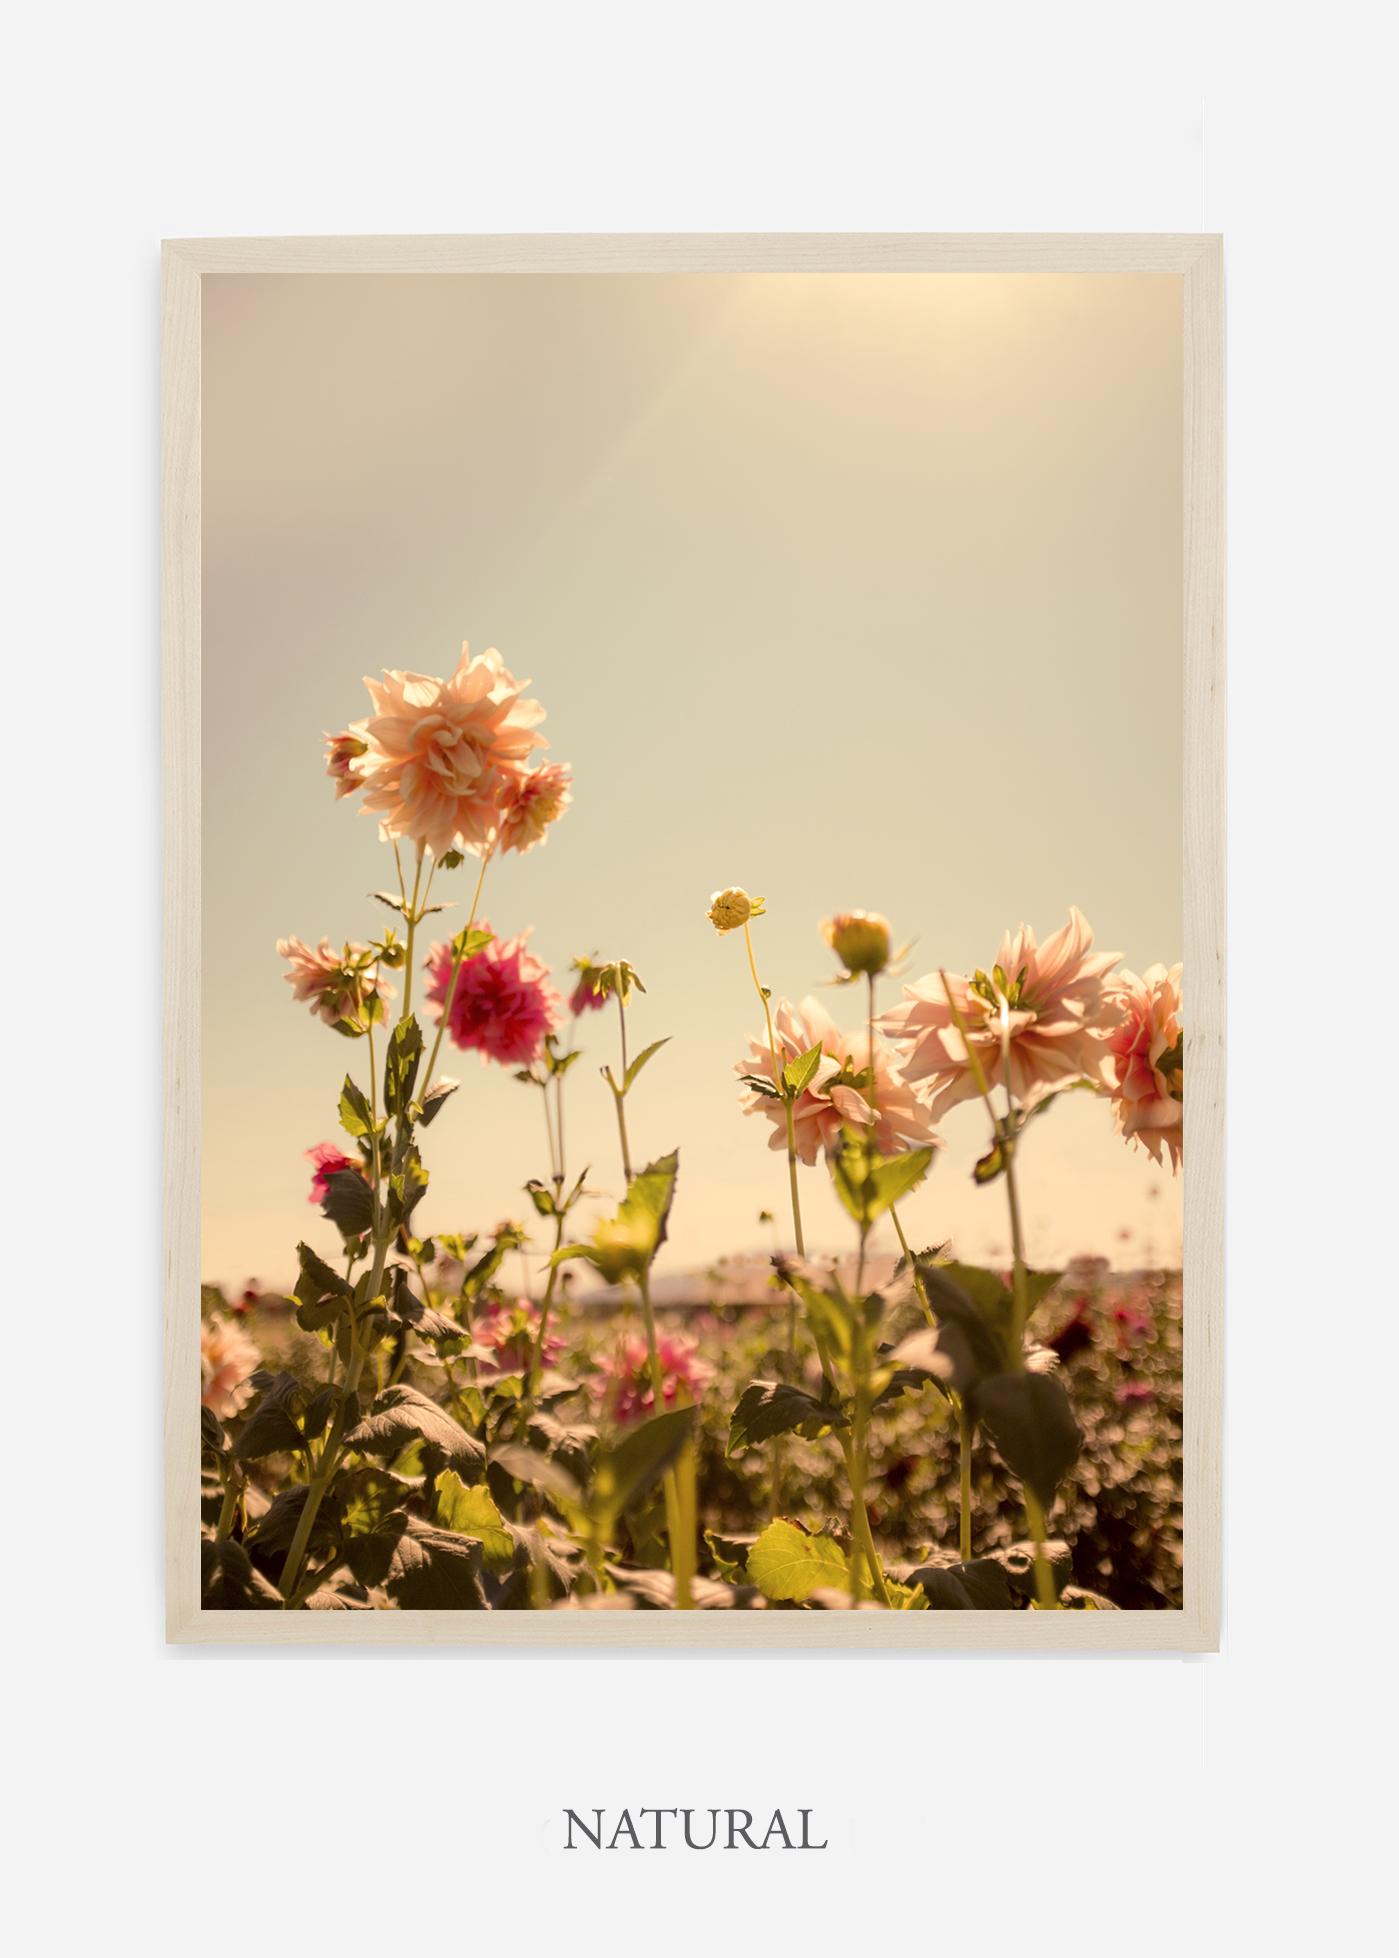 DahliaNo.3_naturalframe__NoMat_interiordesign_botanicalprint_art.jpg